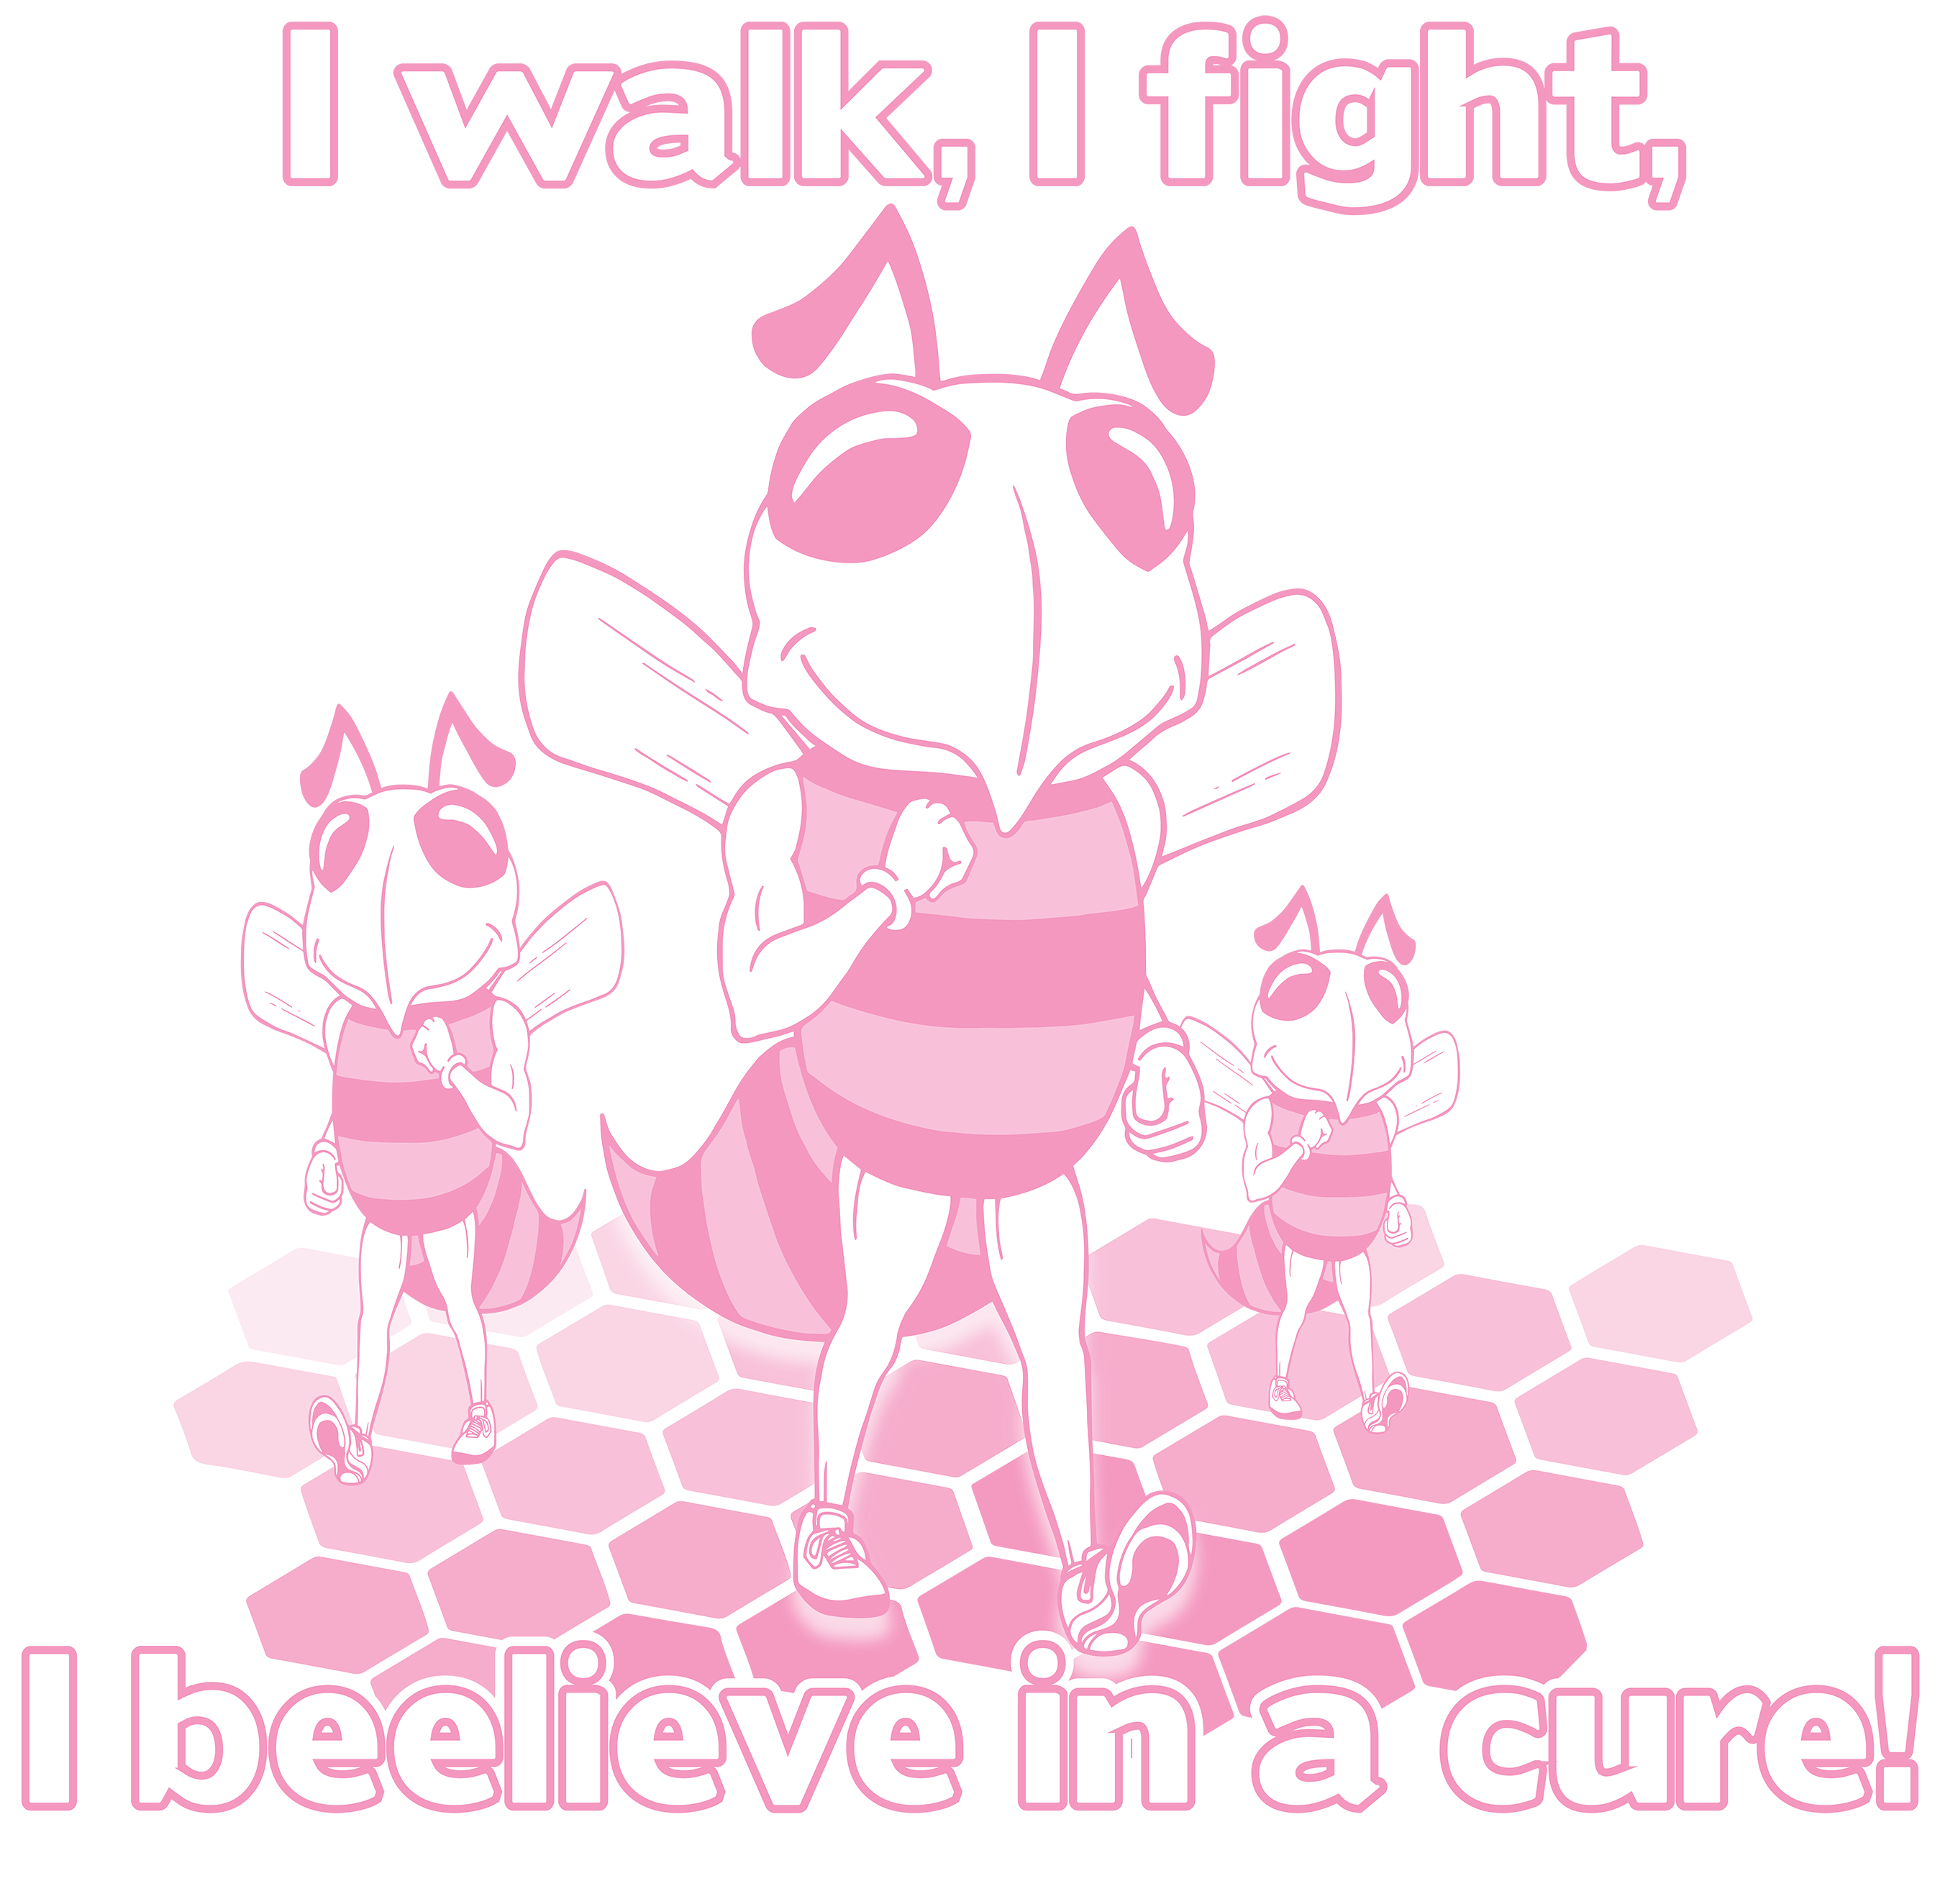 Susan G. Komen Breast Cancer Walk T-Shirt Design